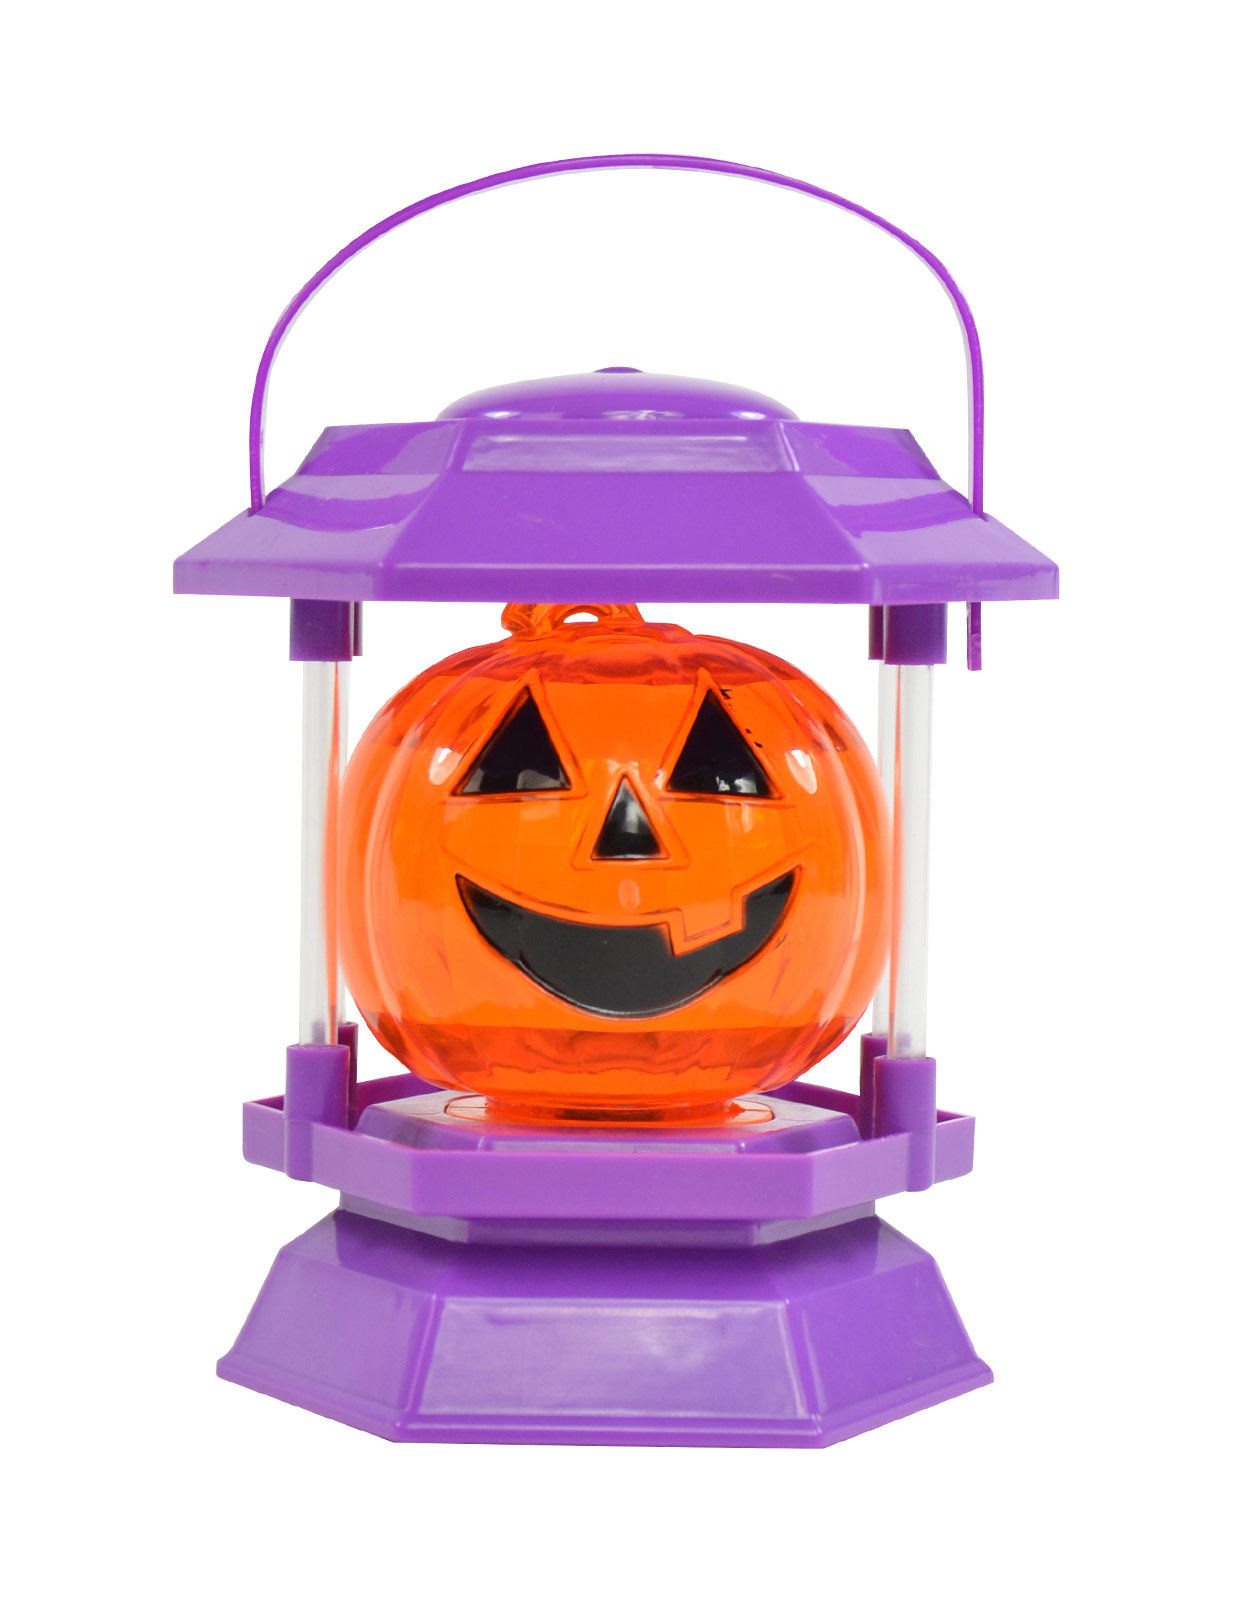 blinkender k rbis halloween party deko lila 11 5x10x17 5cm. Black Bedroom Furniture Sets. Home Design Ideas